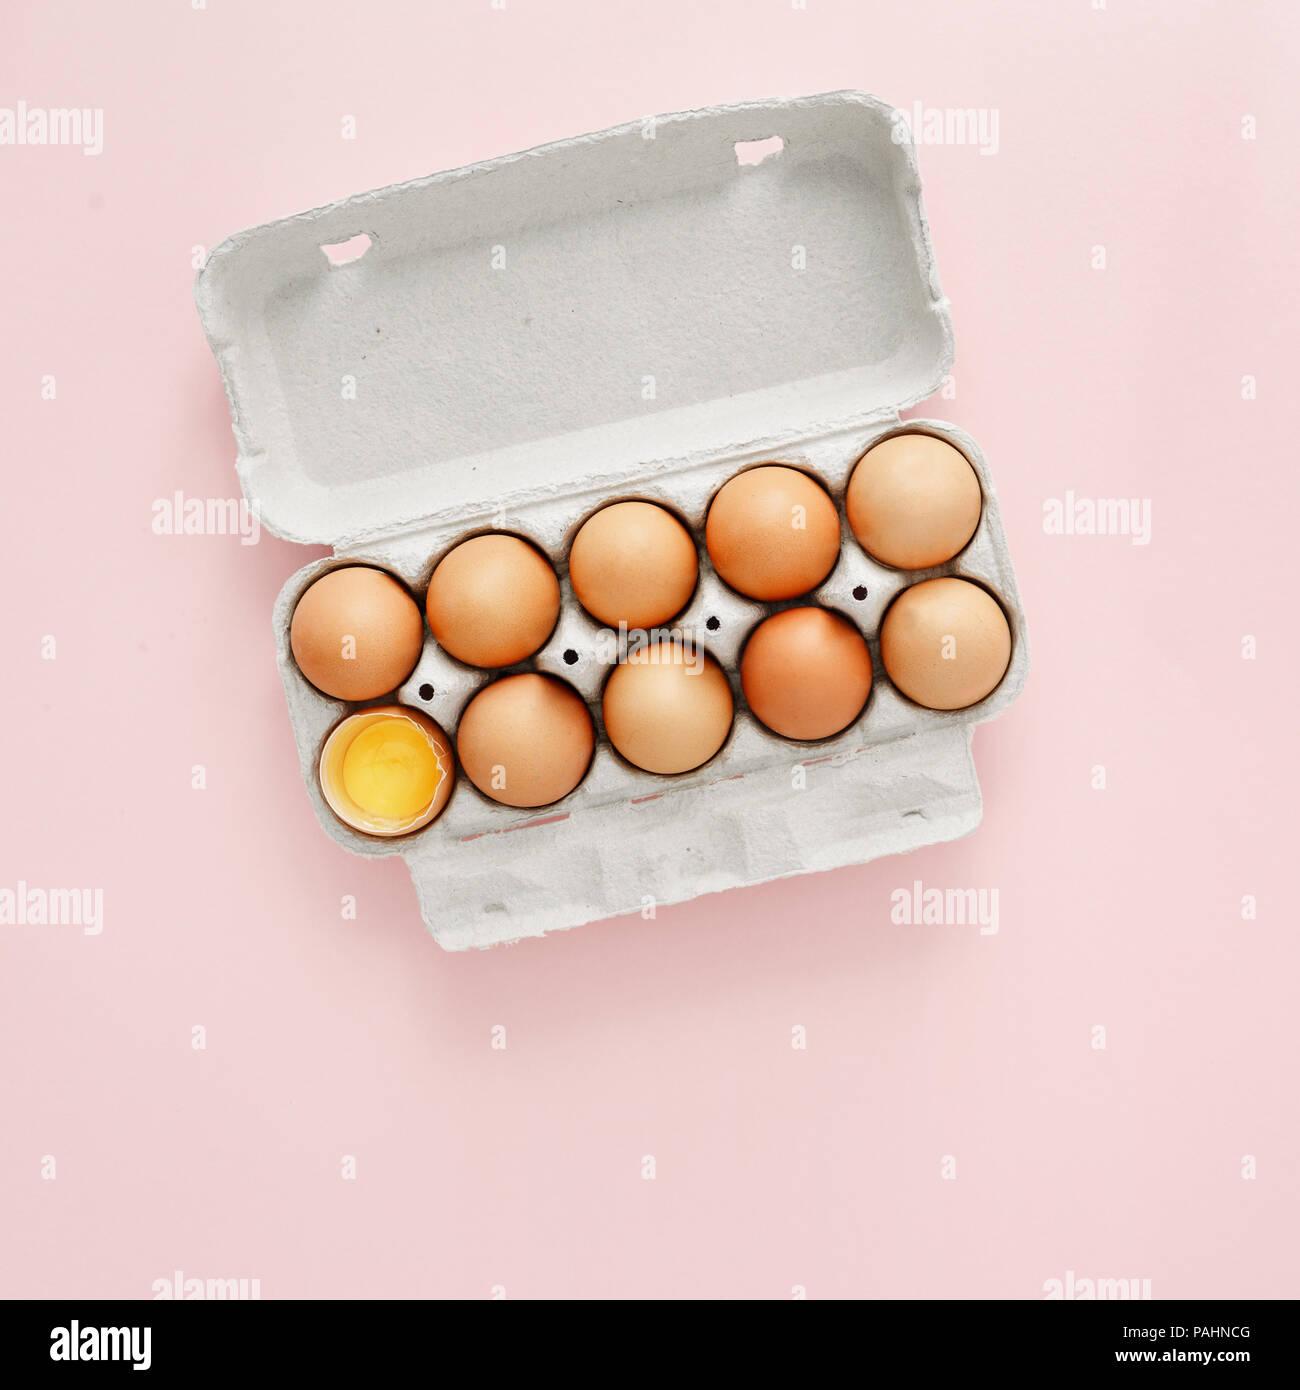 Chicken egg is half broken among other